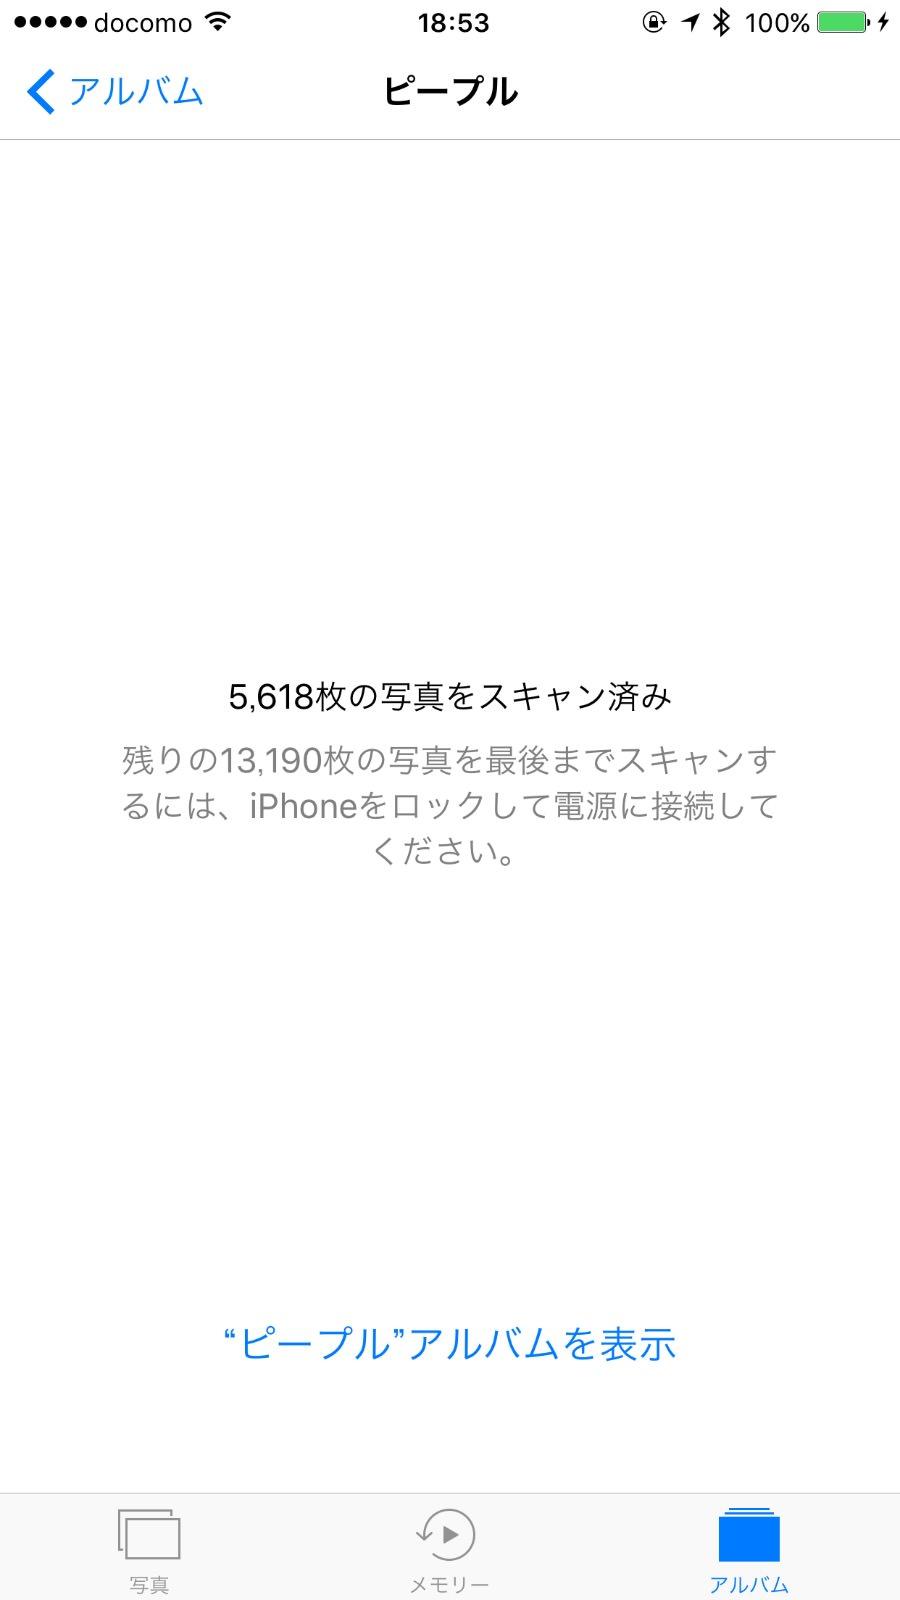 Ios 10 photo 8449